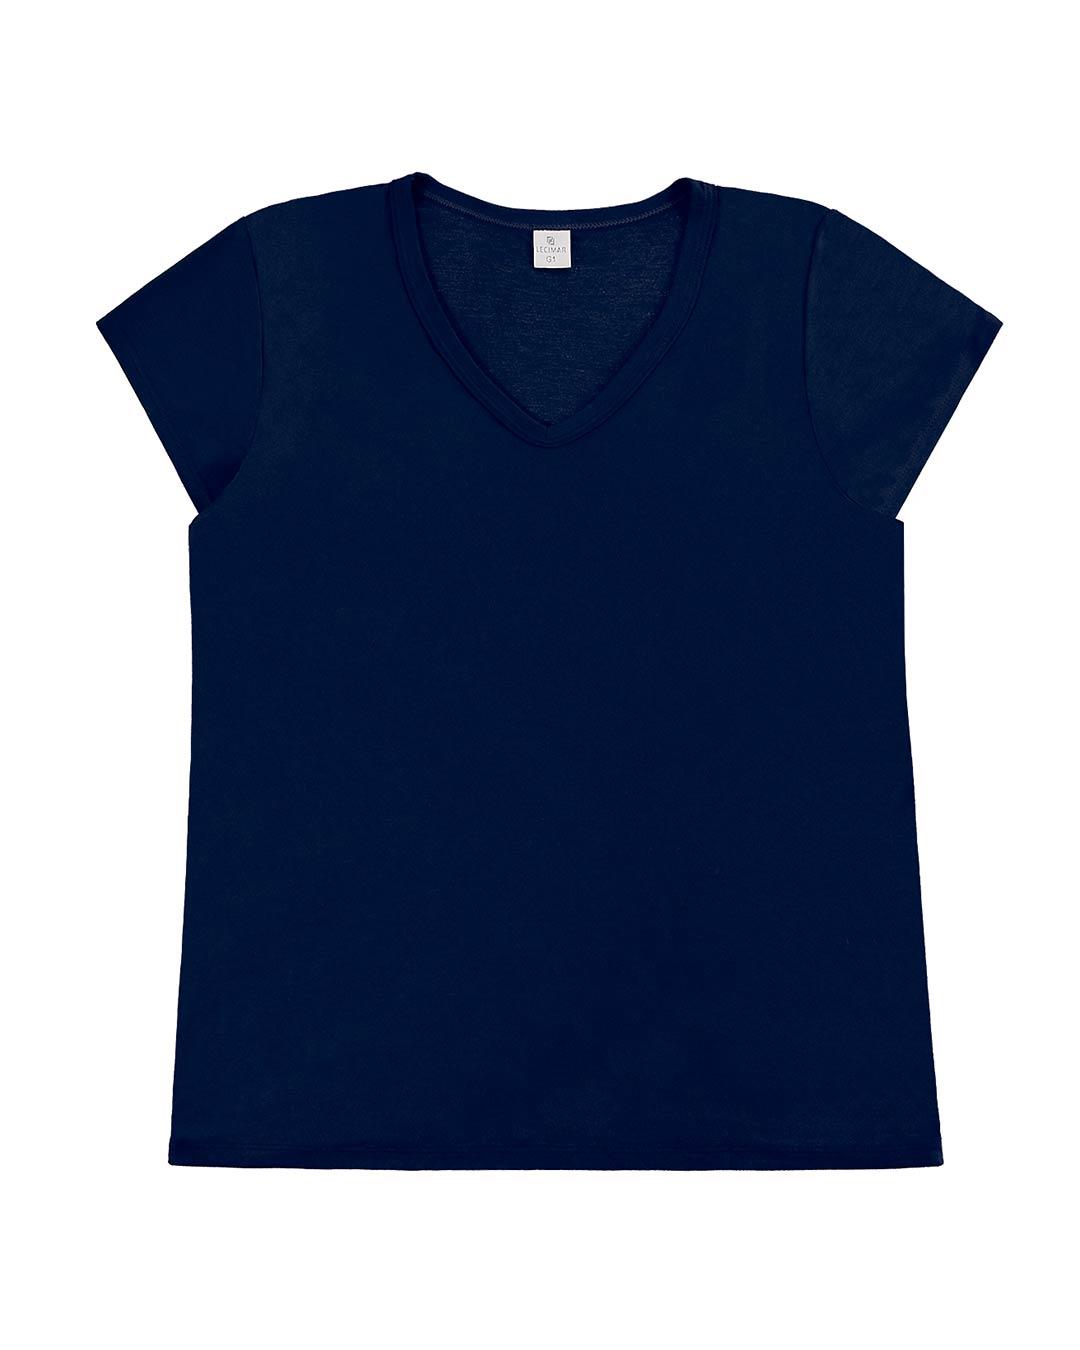 Blusa Feminina Plus Size Lisa em Viscose - Lecimar